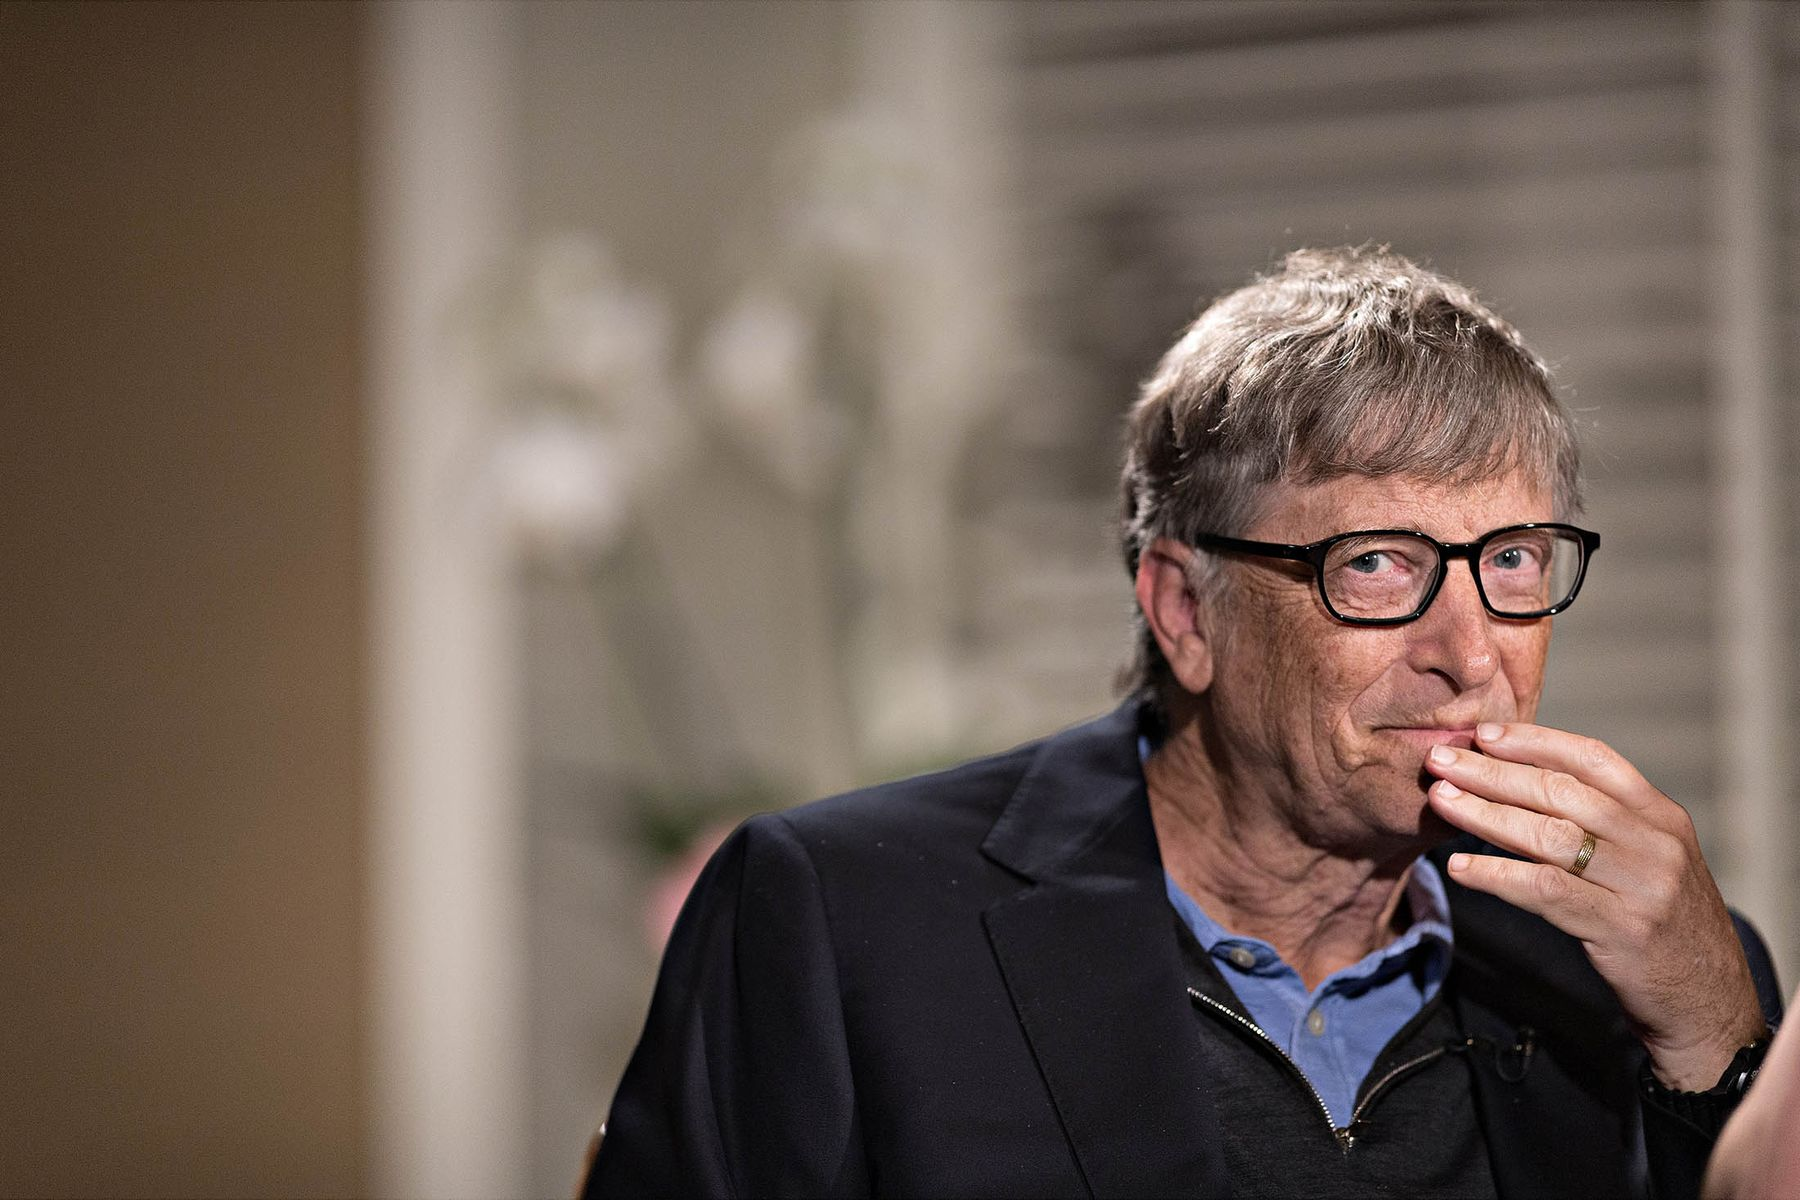 Bill Gates dona 4.600 millones de dólares para fines benéficos